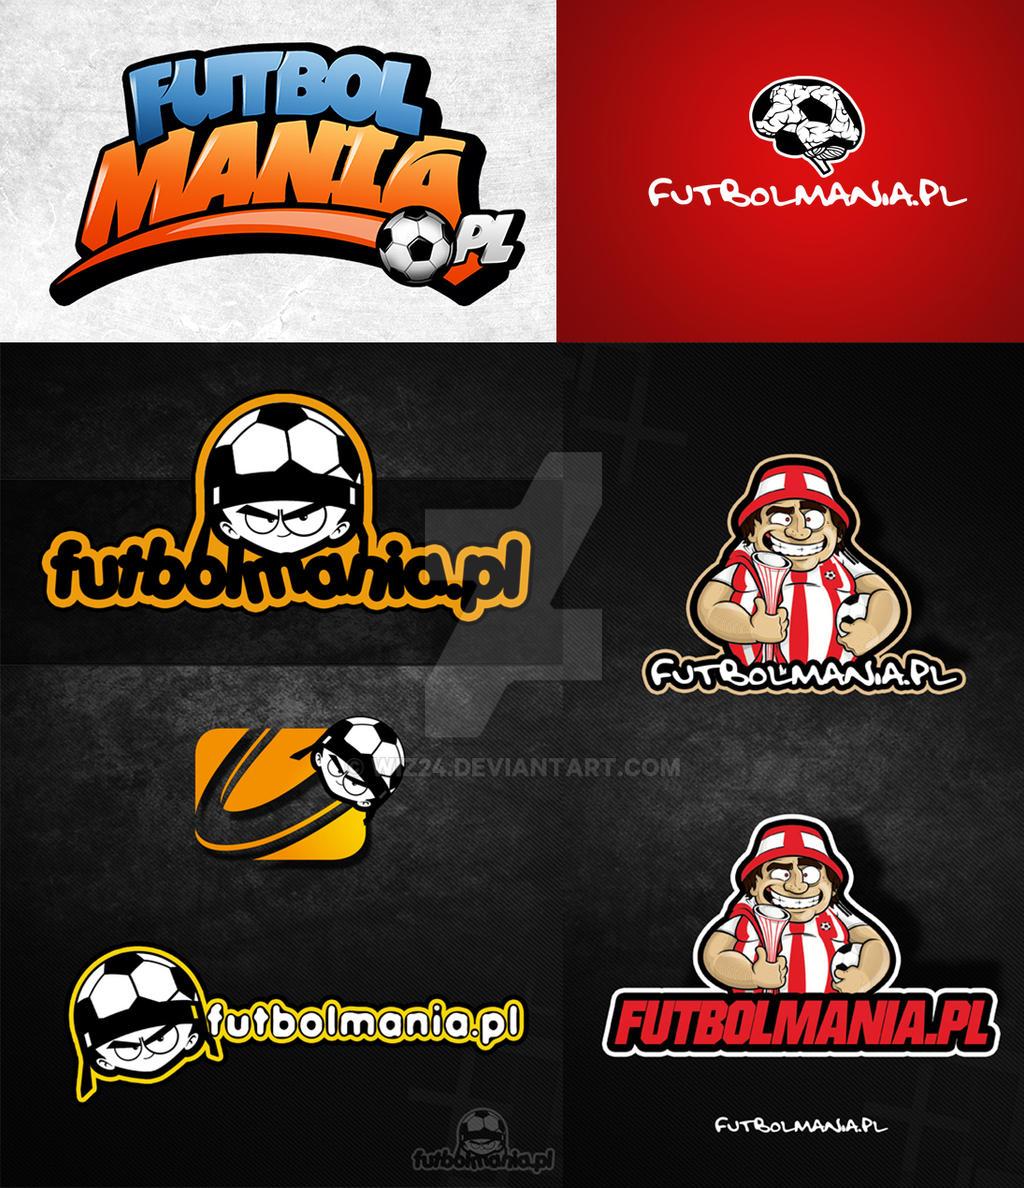 Futbolmania logo concepts by leonegro by wiz24